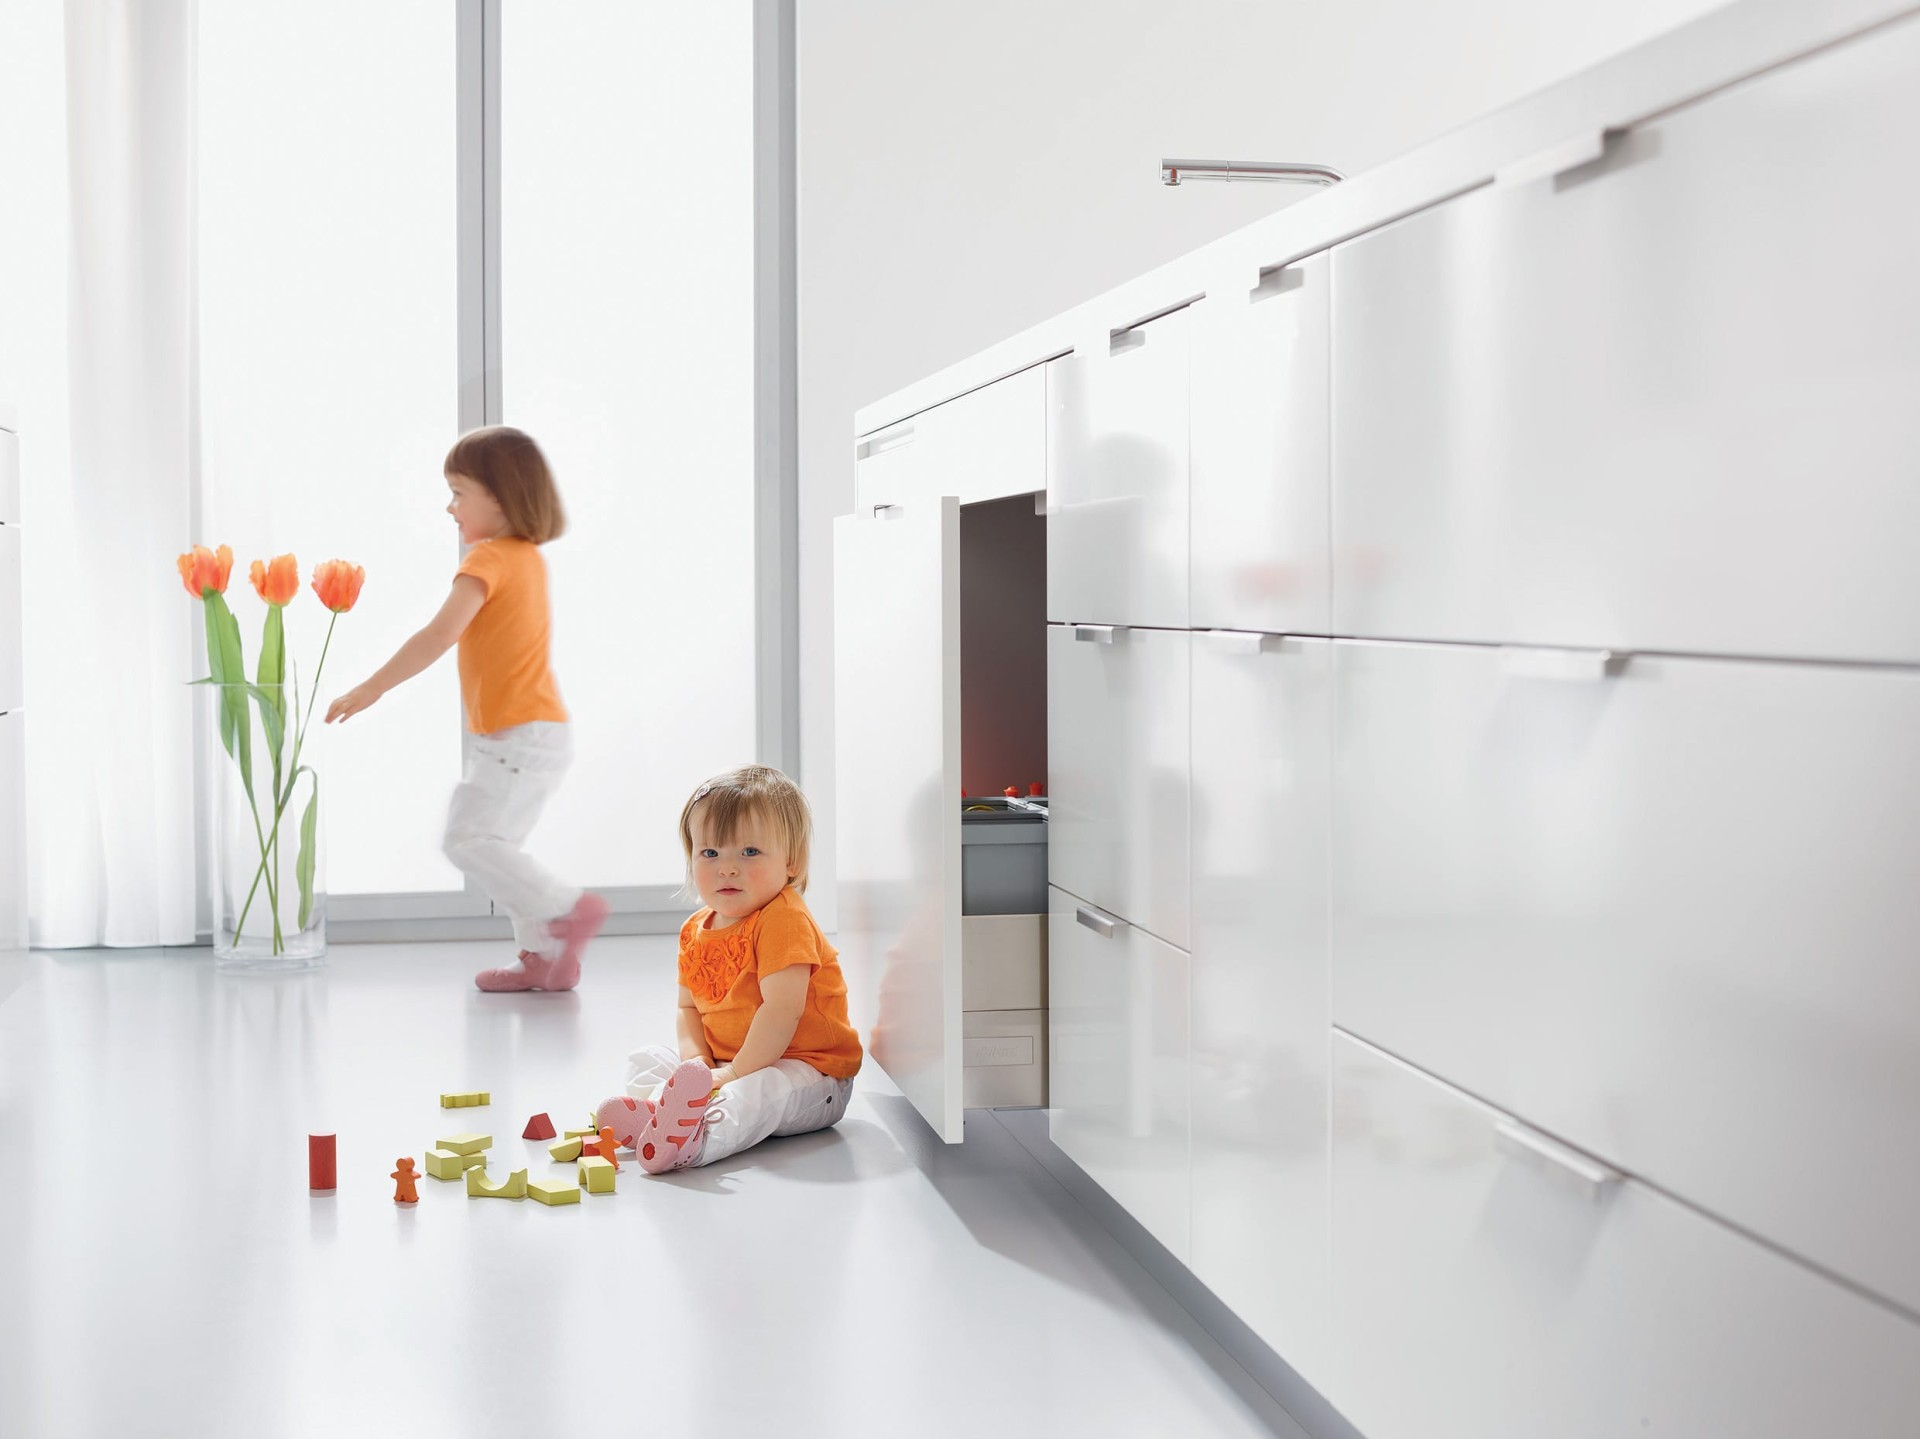 blum kitchen bins rubber mats servo drive uno 单元柜碰碰开 blum厨房垃圾箱